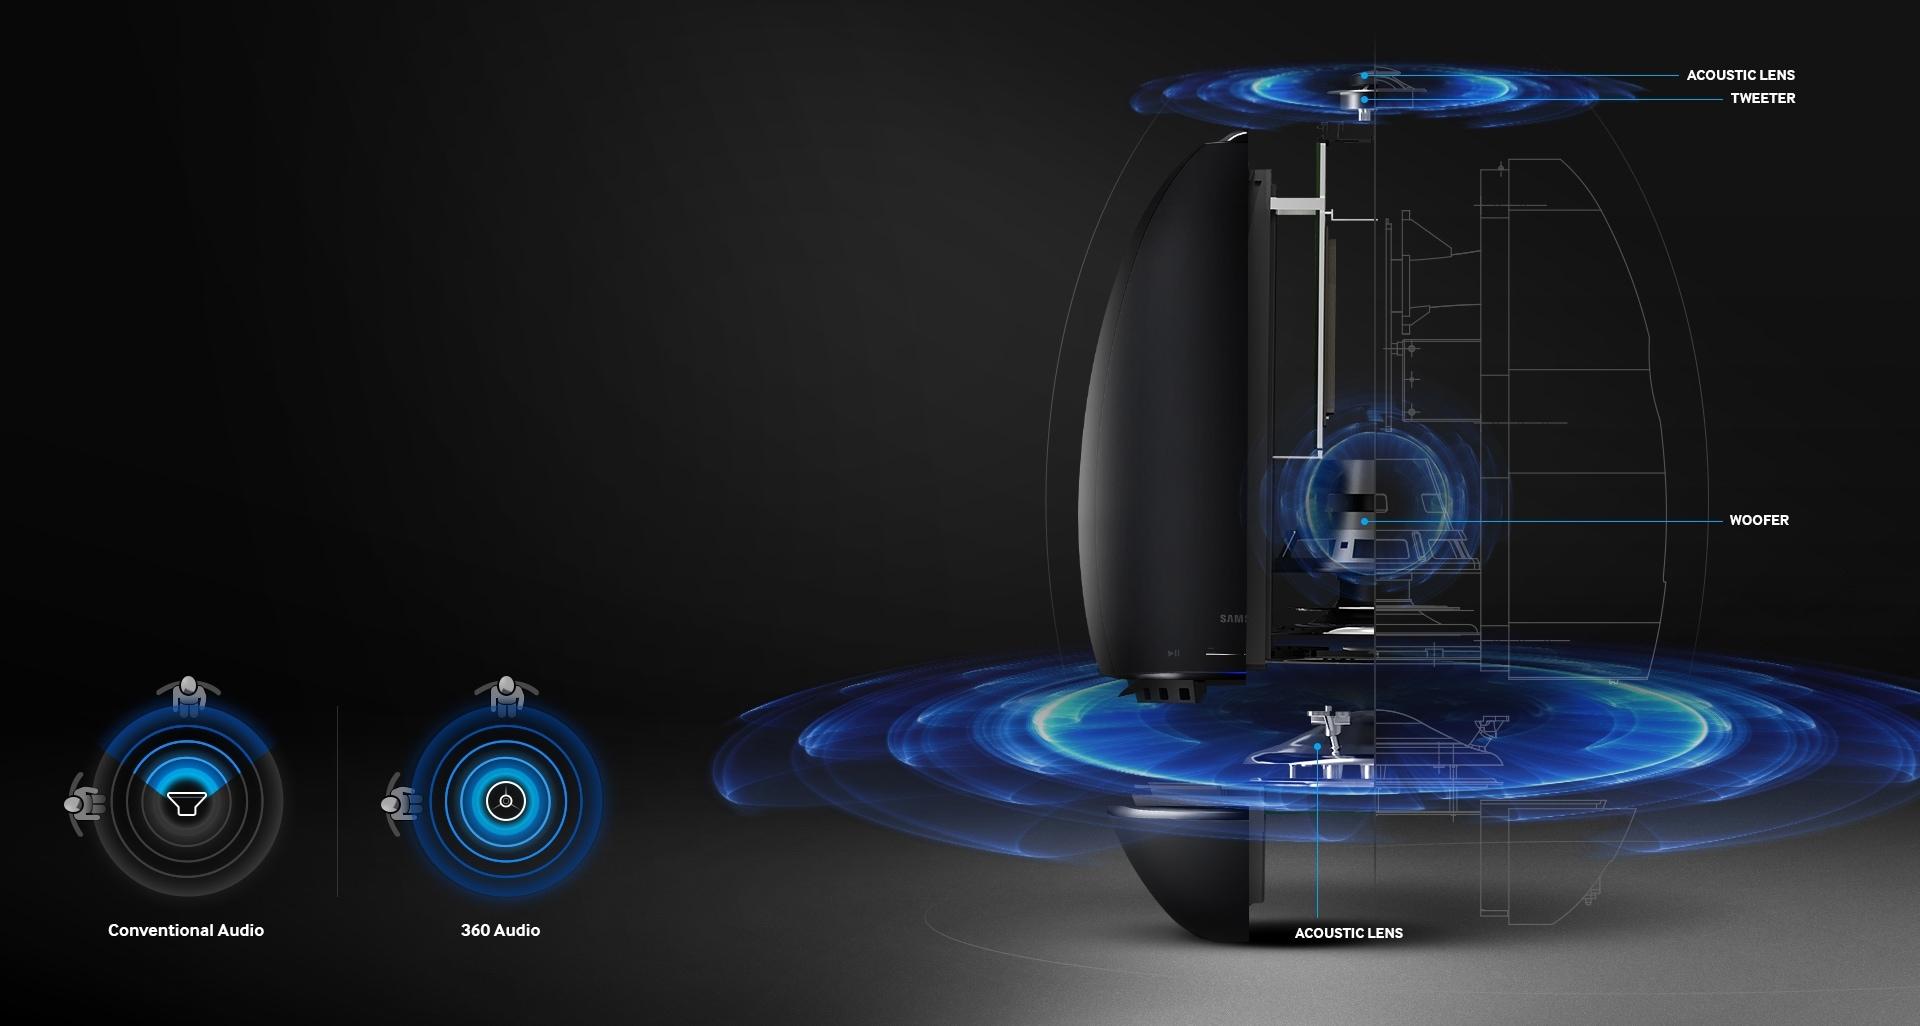 Directional Sound For Fortnite Samsung Wireless Audio 360 Black Color Samsung Ksa